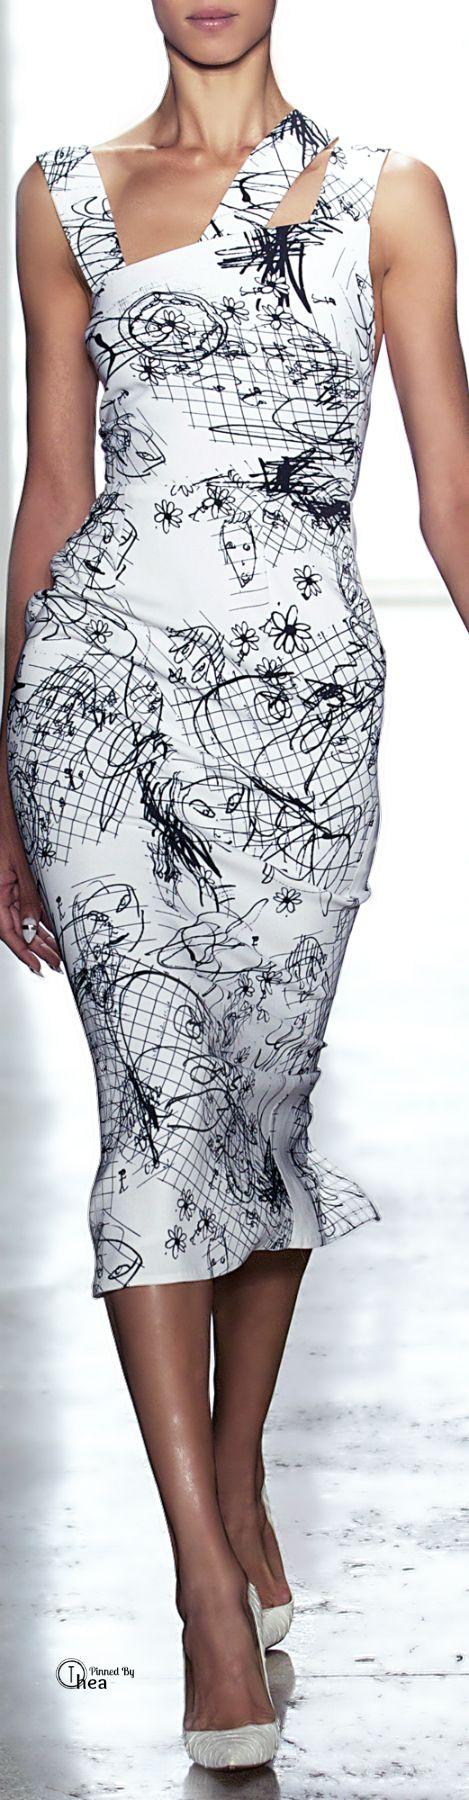 Cushnie et Ochs ● SS 2014, Printed Viscose Triple Strap Dress